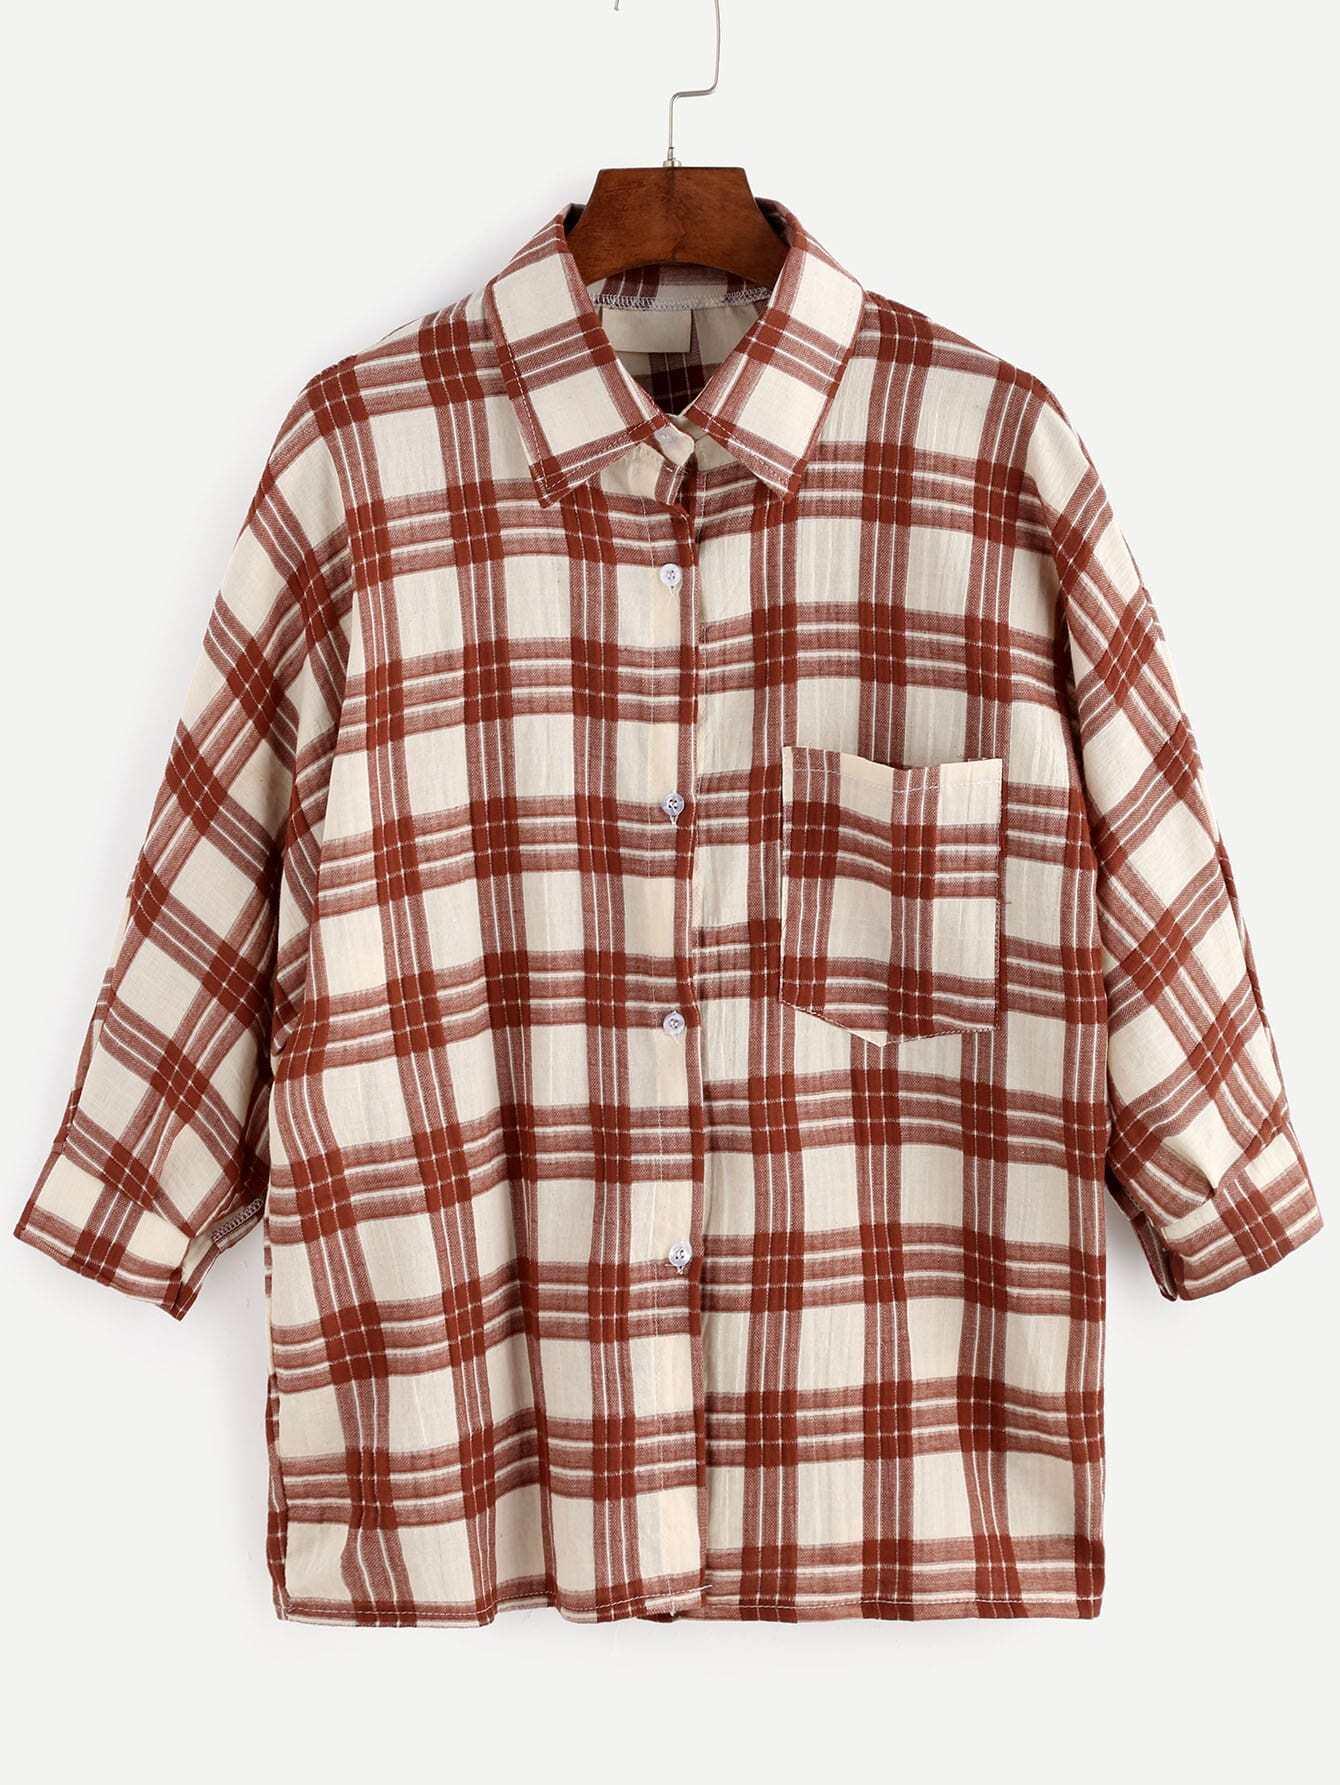 blouse160805105_2